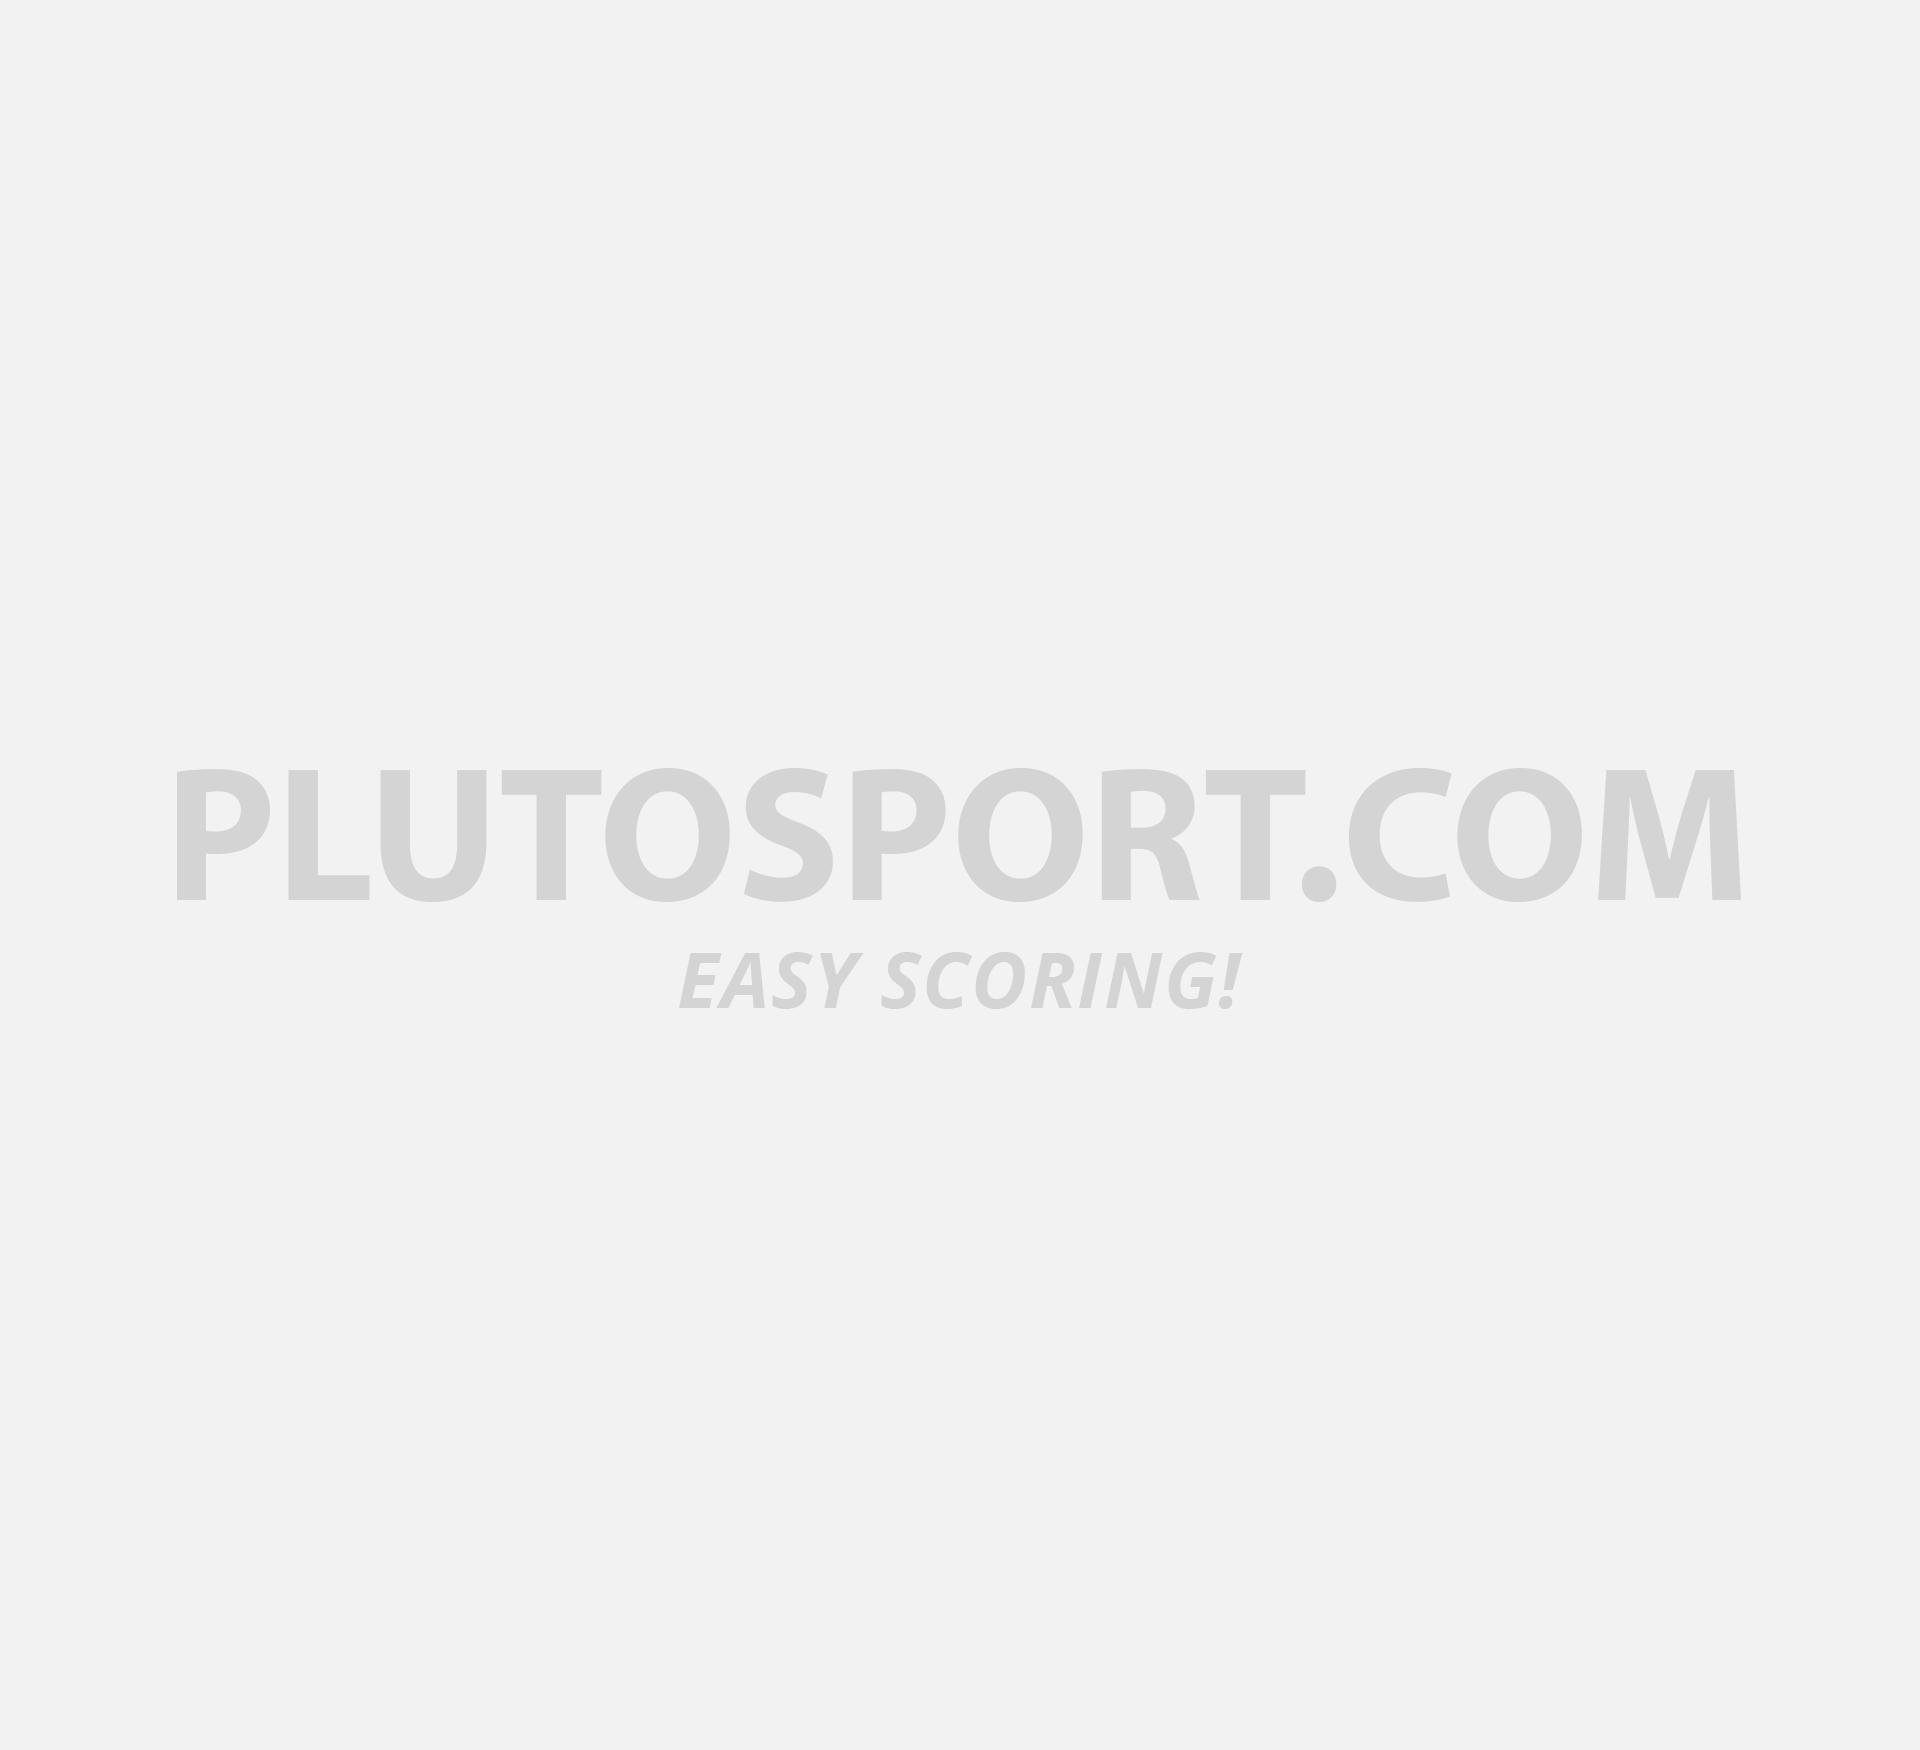 923453f88b151 Superdry Ultimate Snow Rescue Jacket - Superdry - Brands | Plutosport